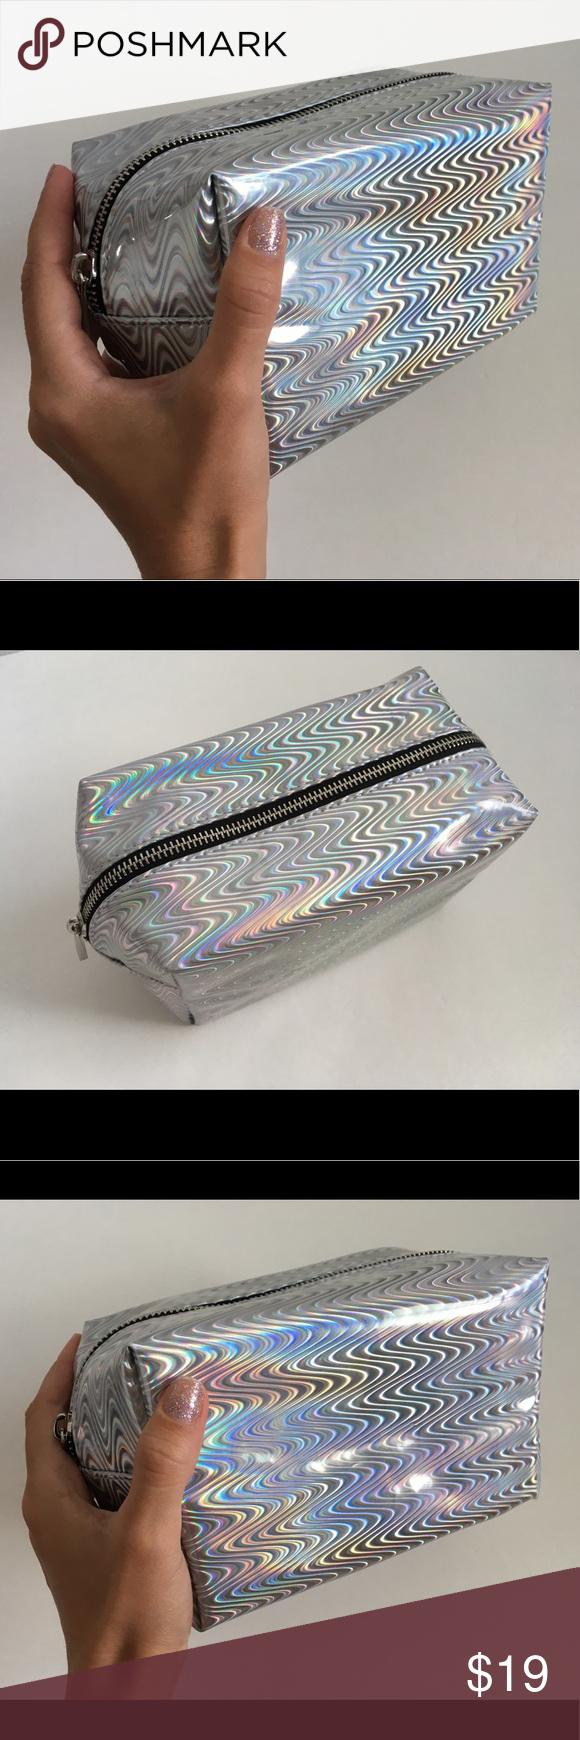 Hologram Holographic Iridescent Makeup Bag Hologram Makeup